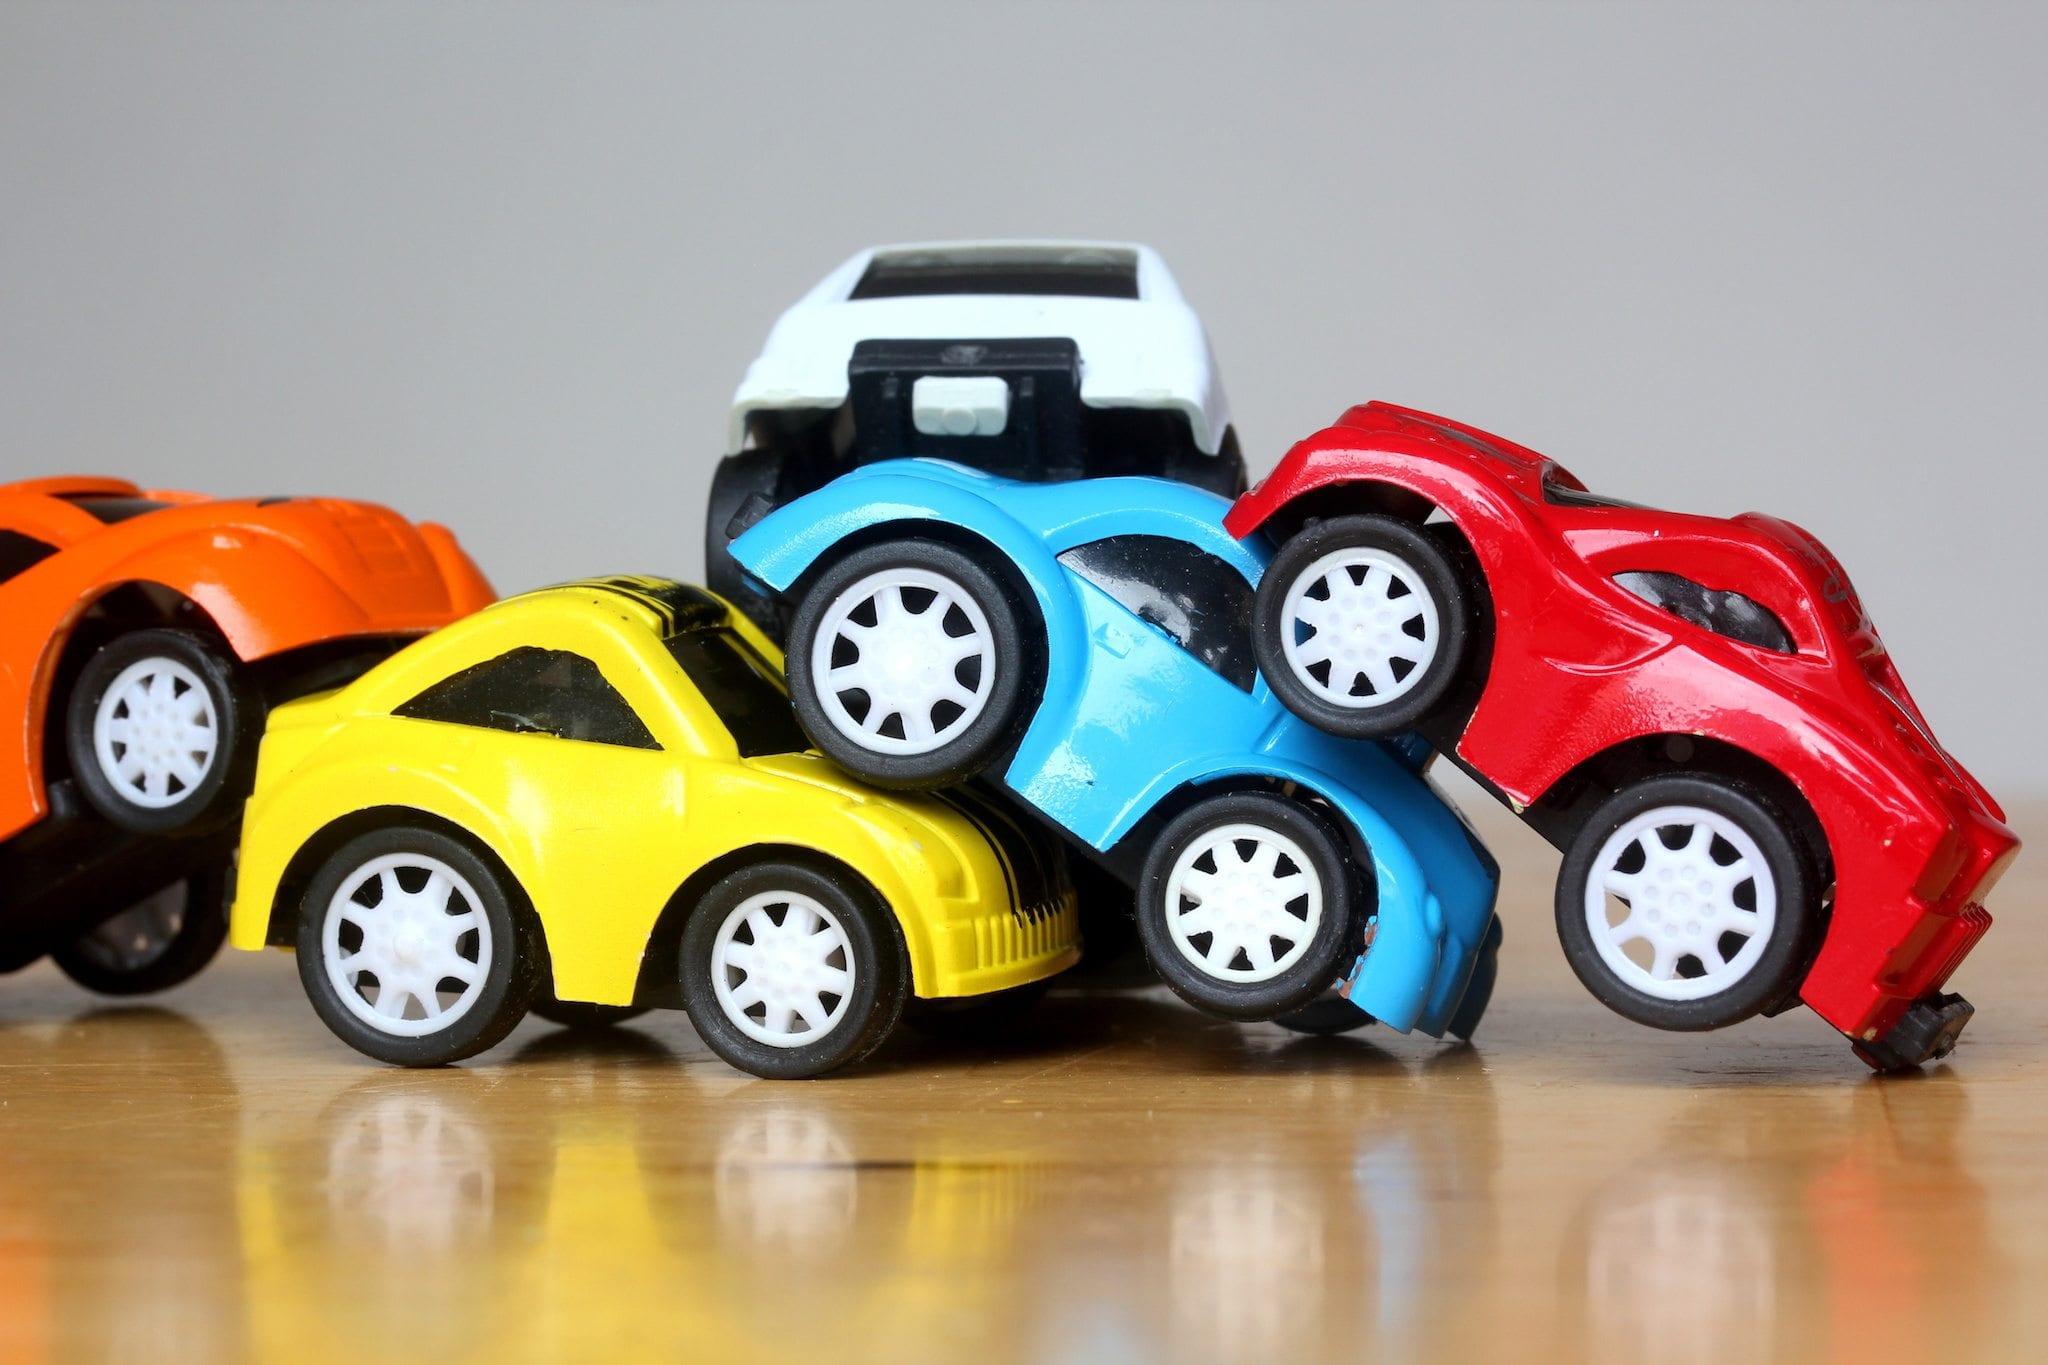 Alberta Car Insurance Reference Guide Alberta Autobody Shops